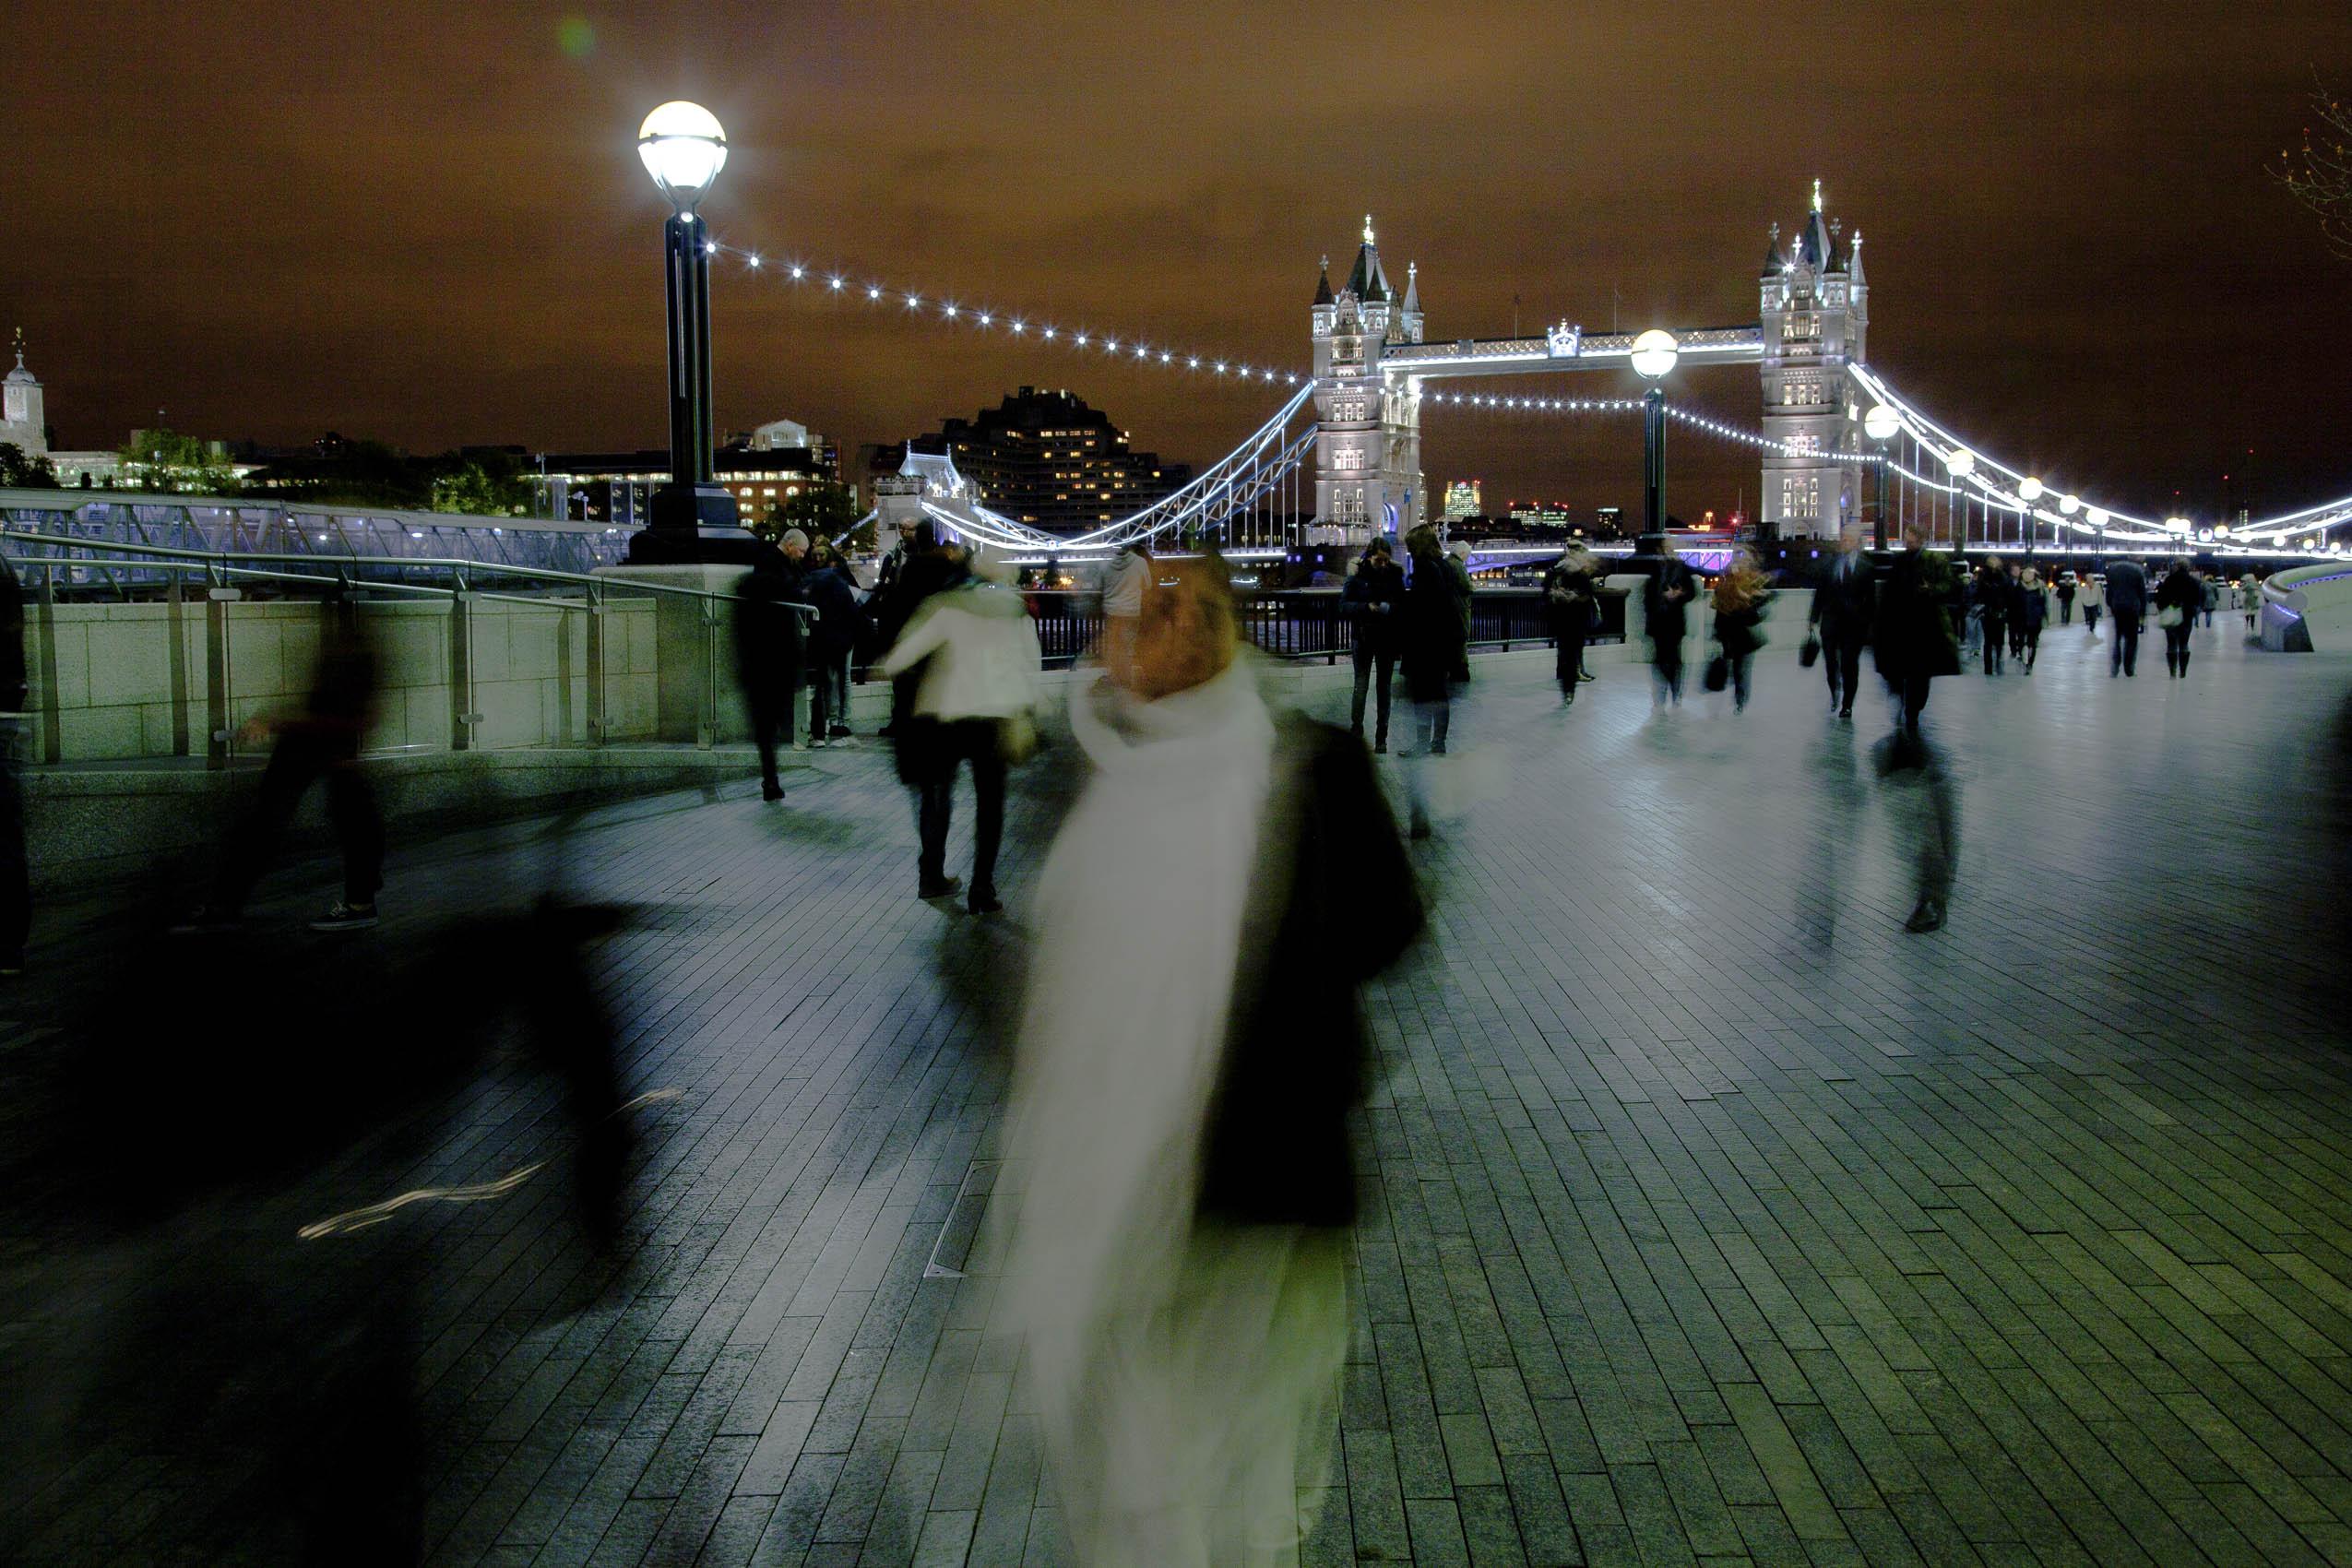 londoon_tower_bridge_abstract.jpg